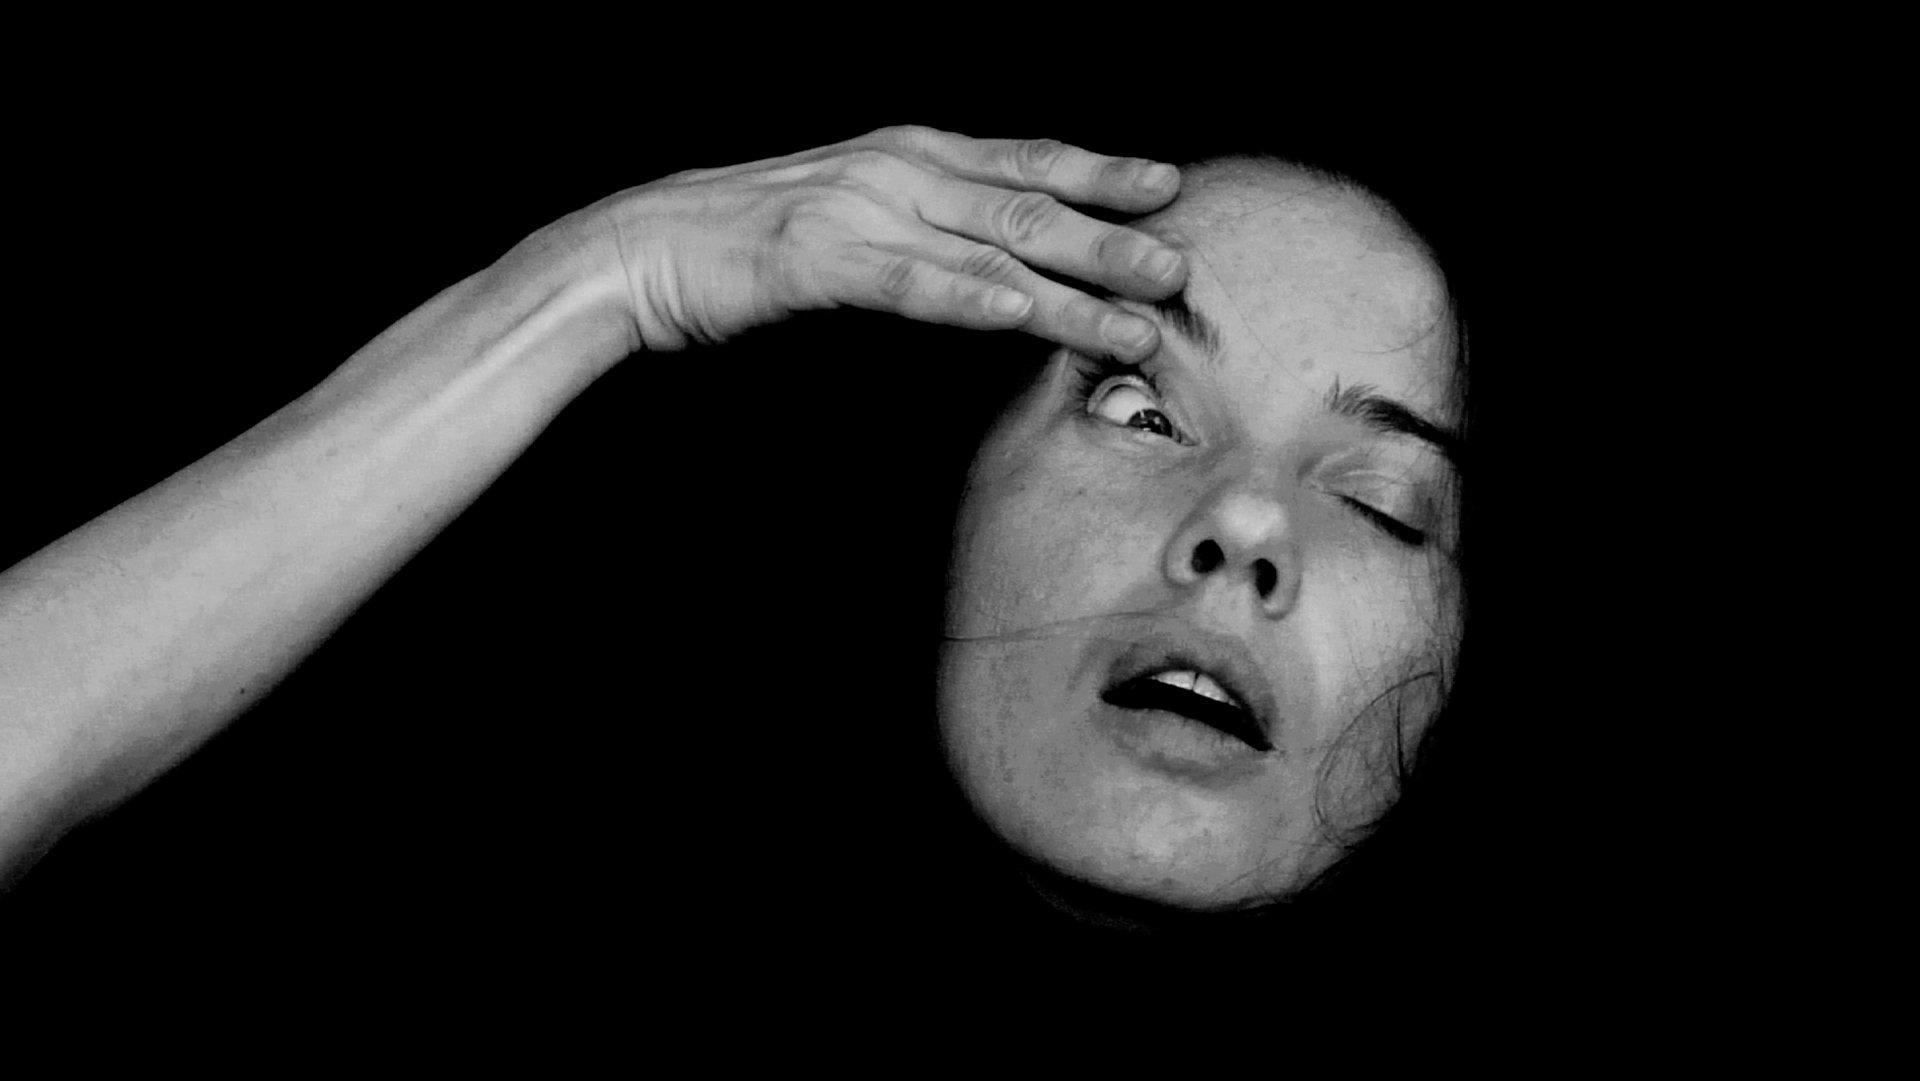 Aneta Grzeszykowska, Headache, 2008, Videostill